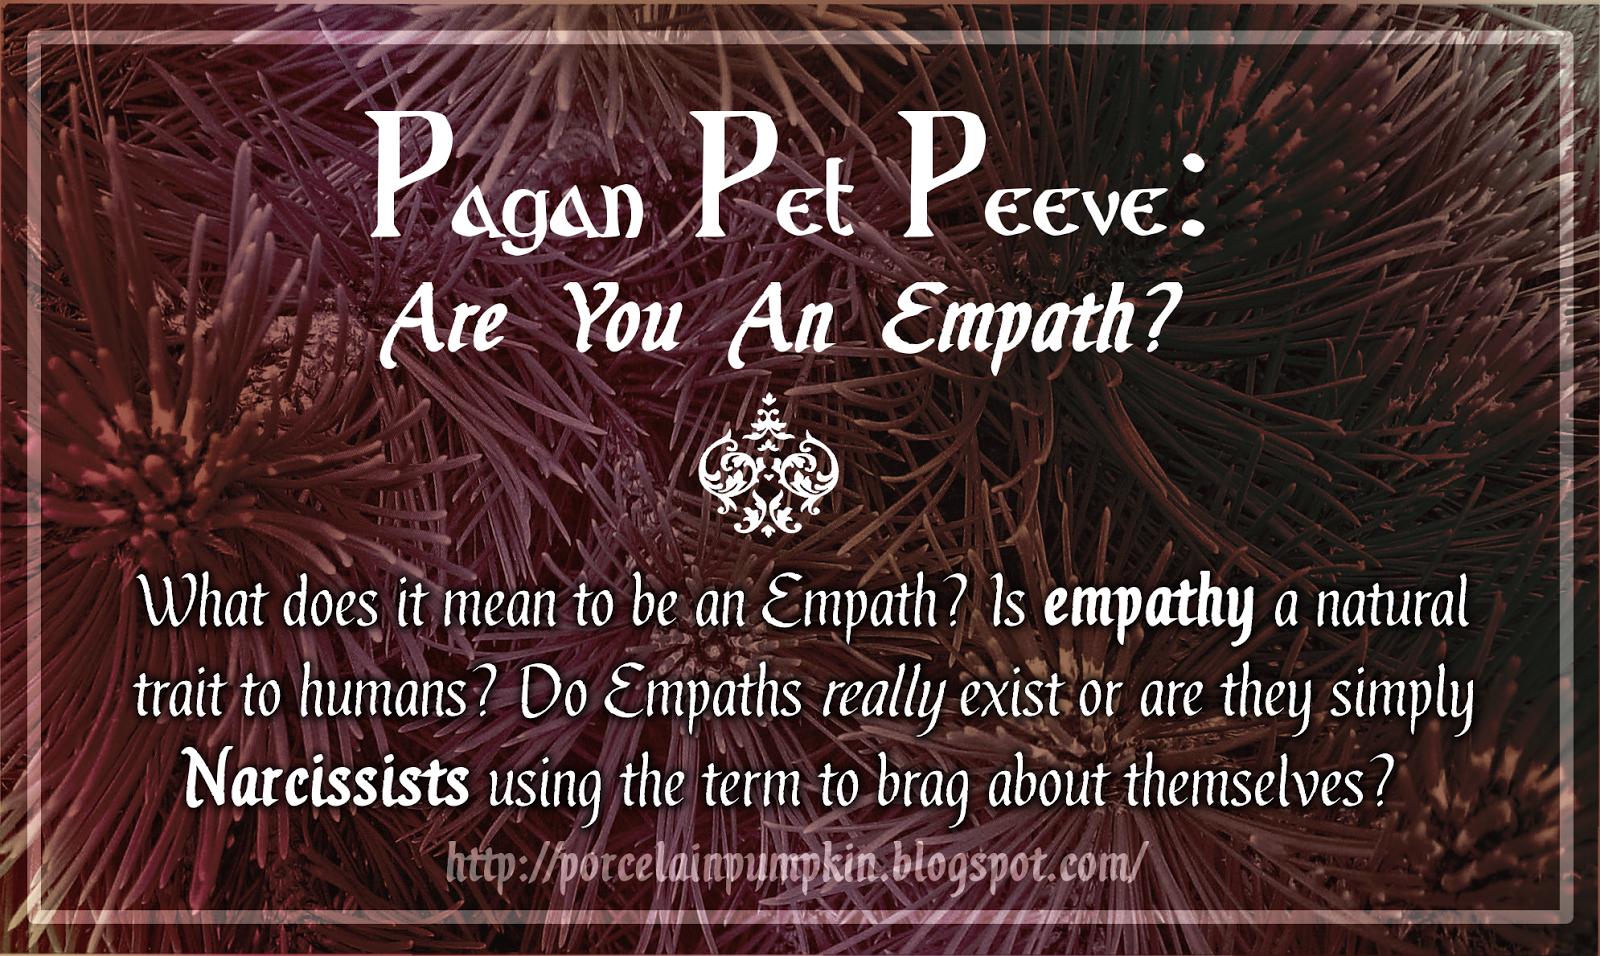 The Porcelain Pumpkin: Pagan Pet Peeve: Are You an Empath?